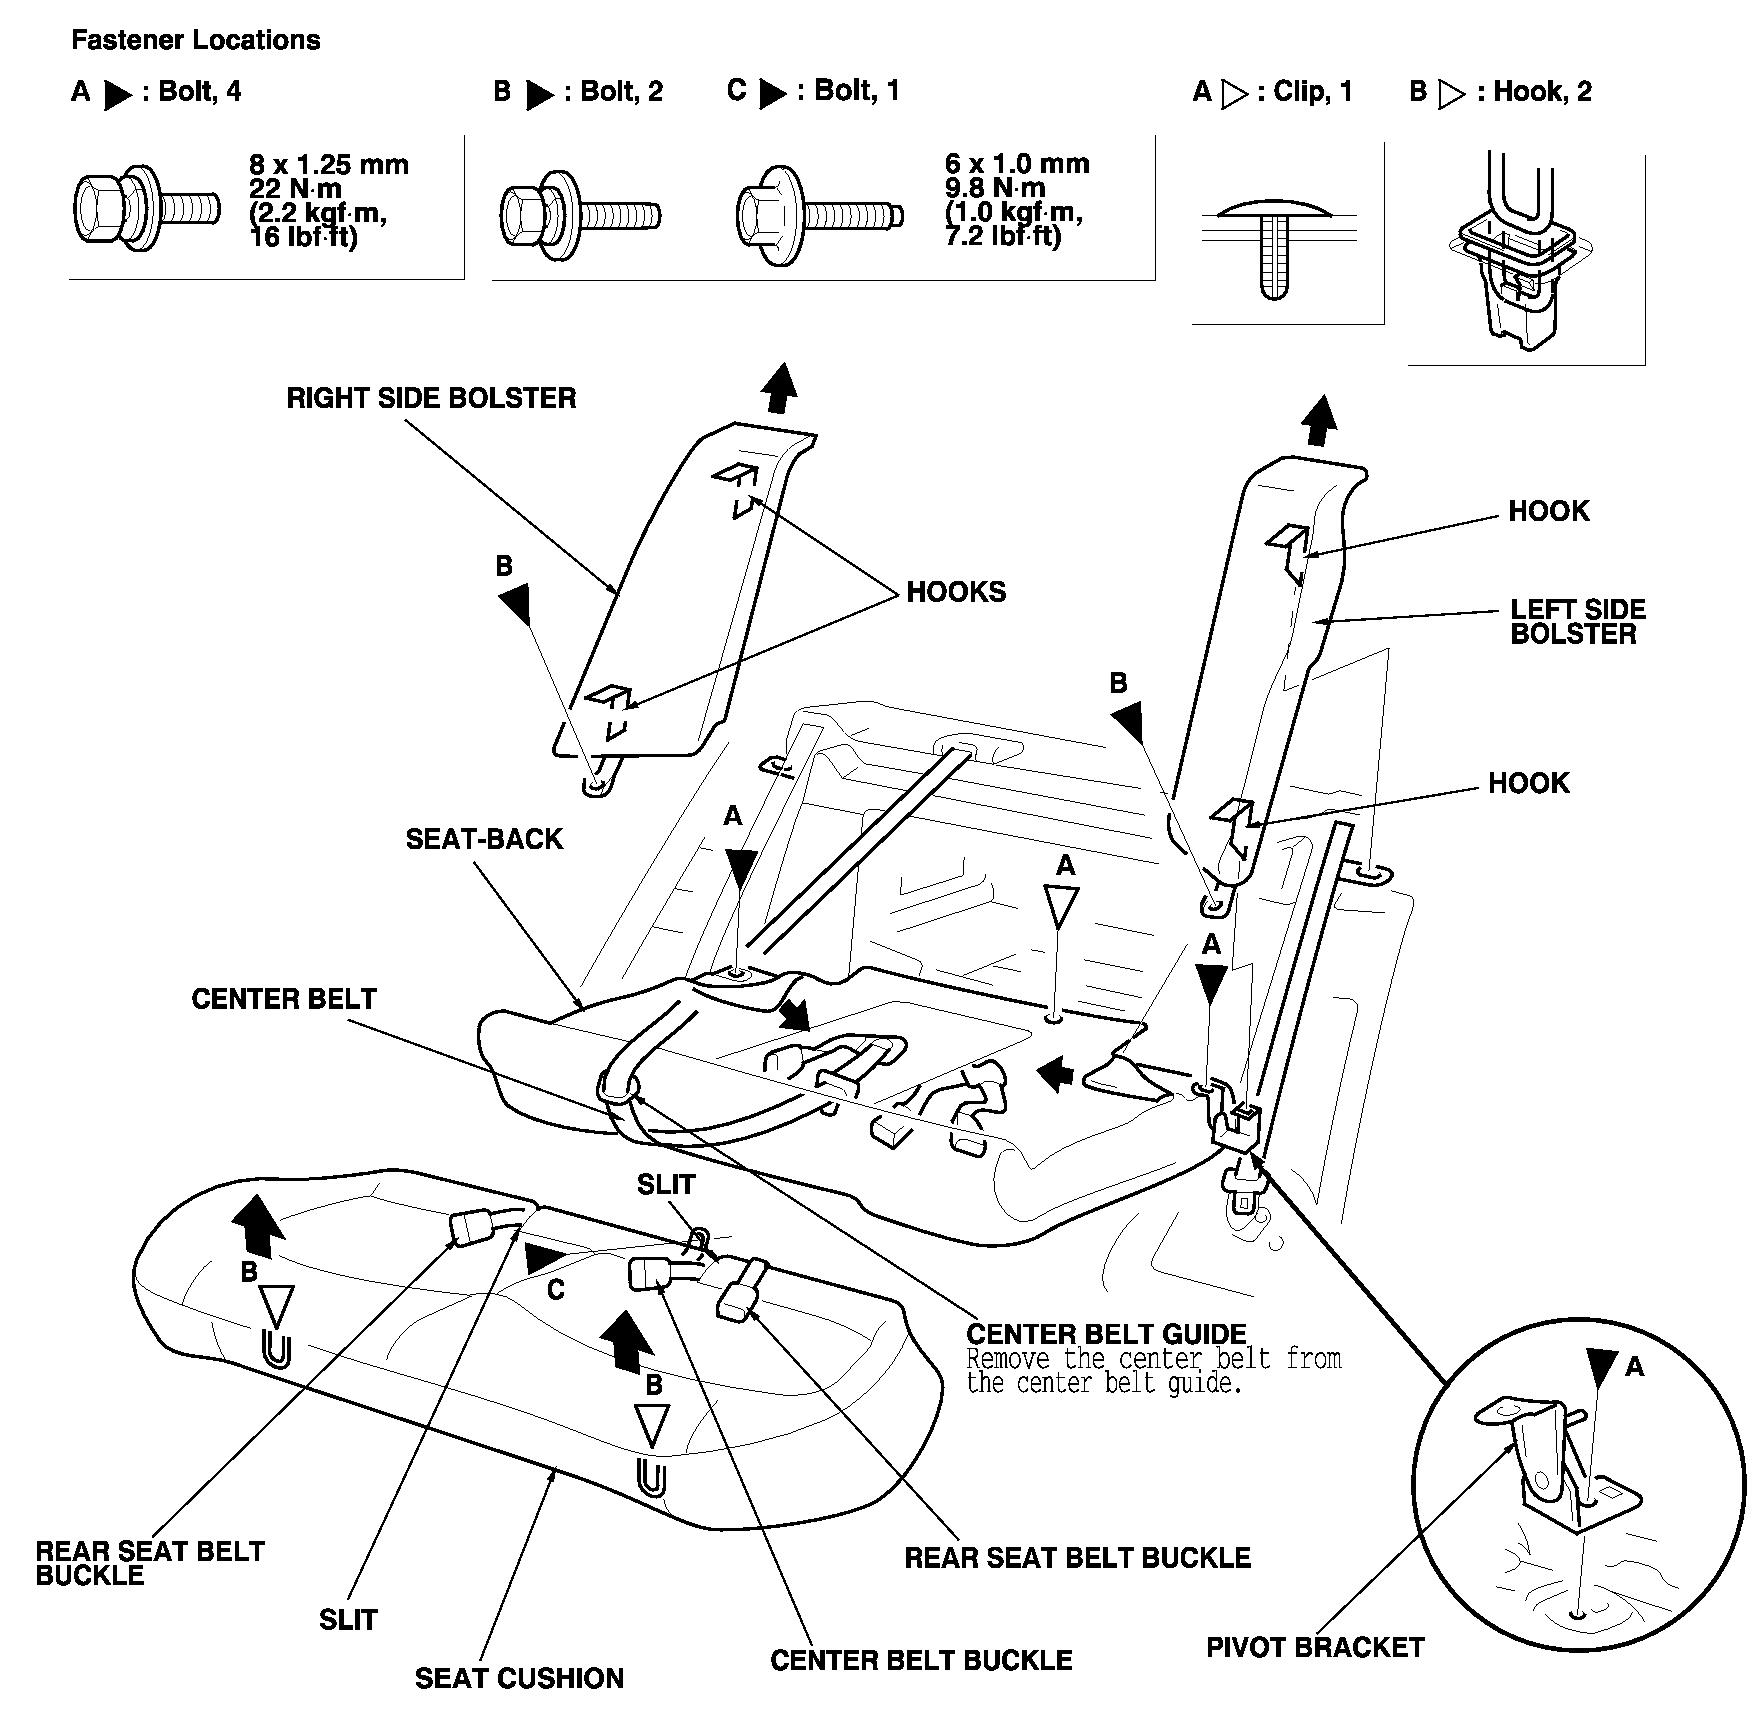 Graphic Hondaservice7791 Honda Technician